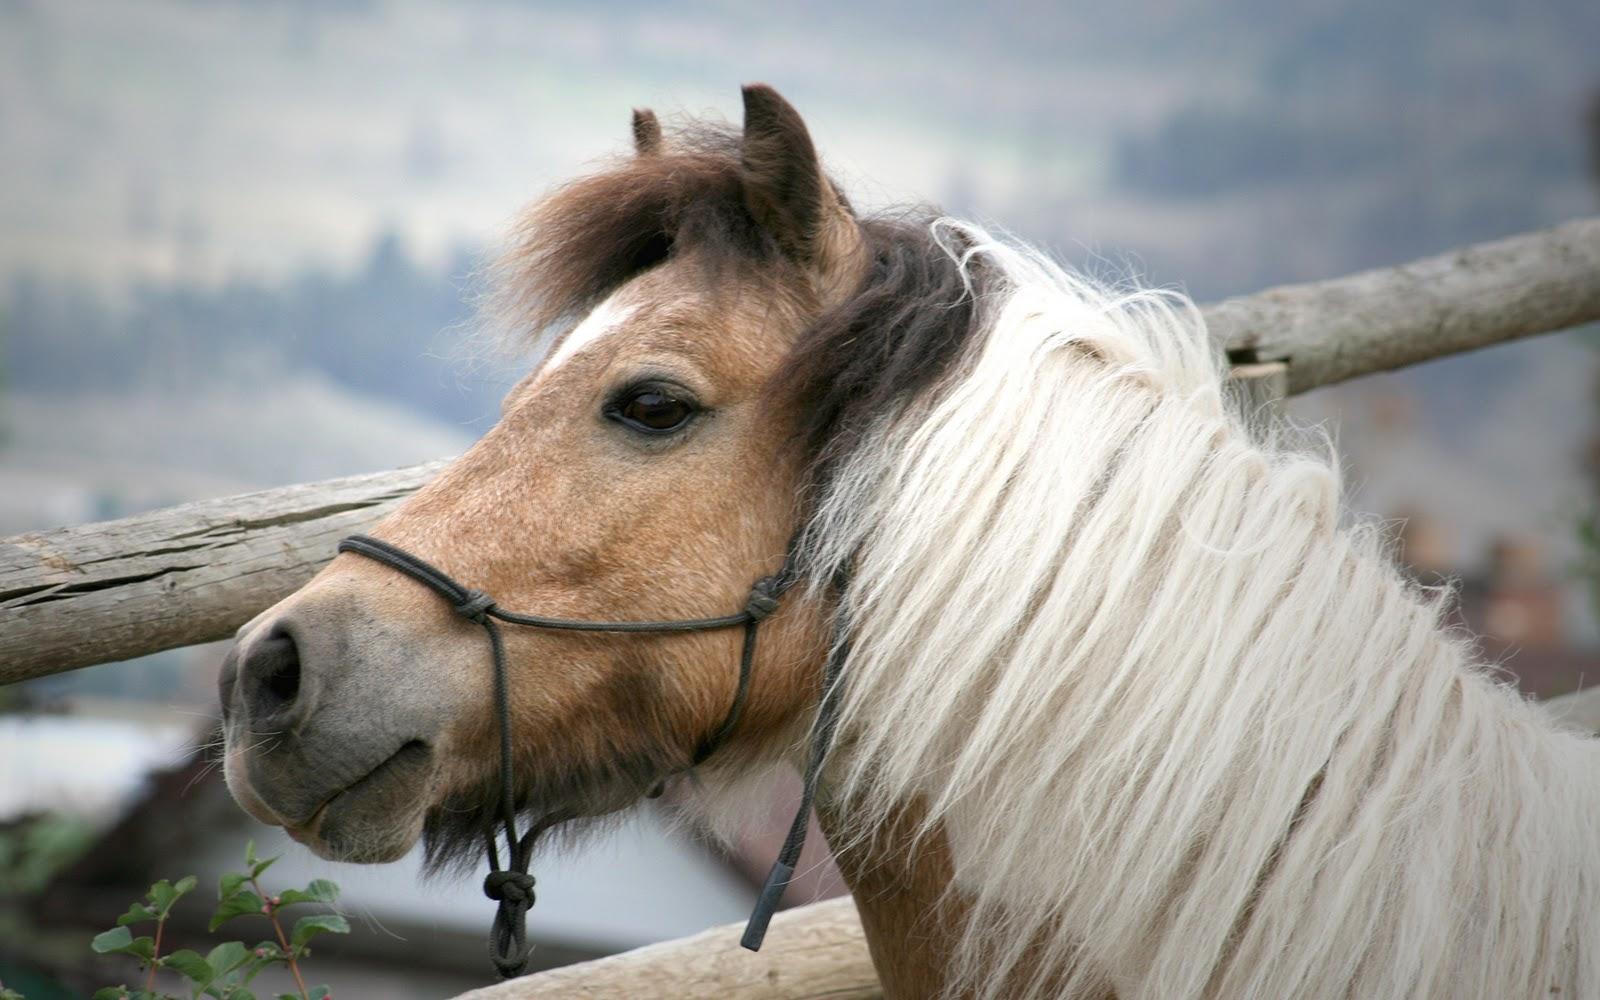 Simple   Wallpaper Horse Flicka - Horses+Wallpapers+1920x1200-2  Pictures_488160.jpg